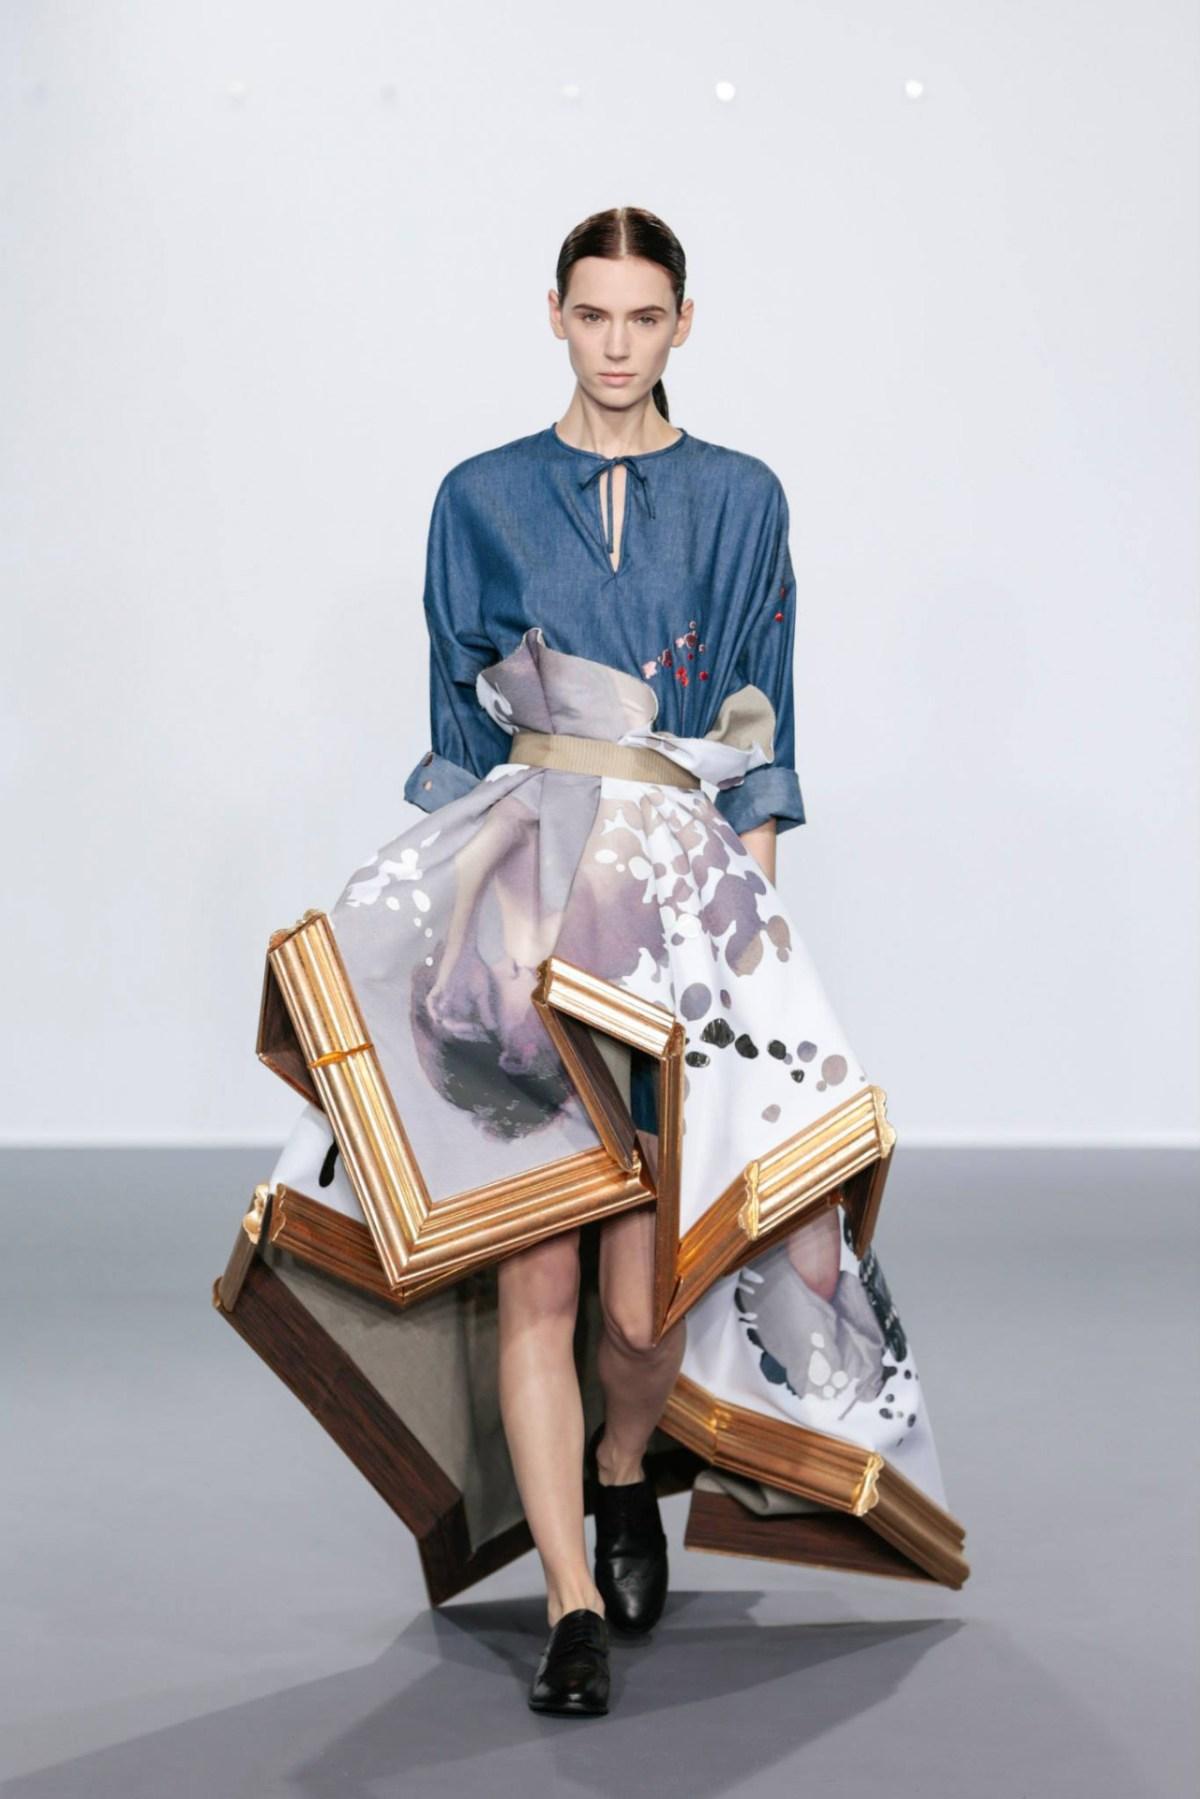 framed-painting-clothing-by-duthc-designer-viktor-and-rolf-03